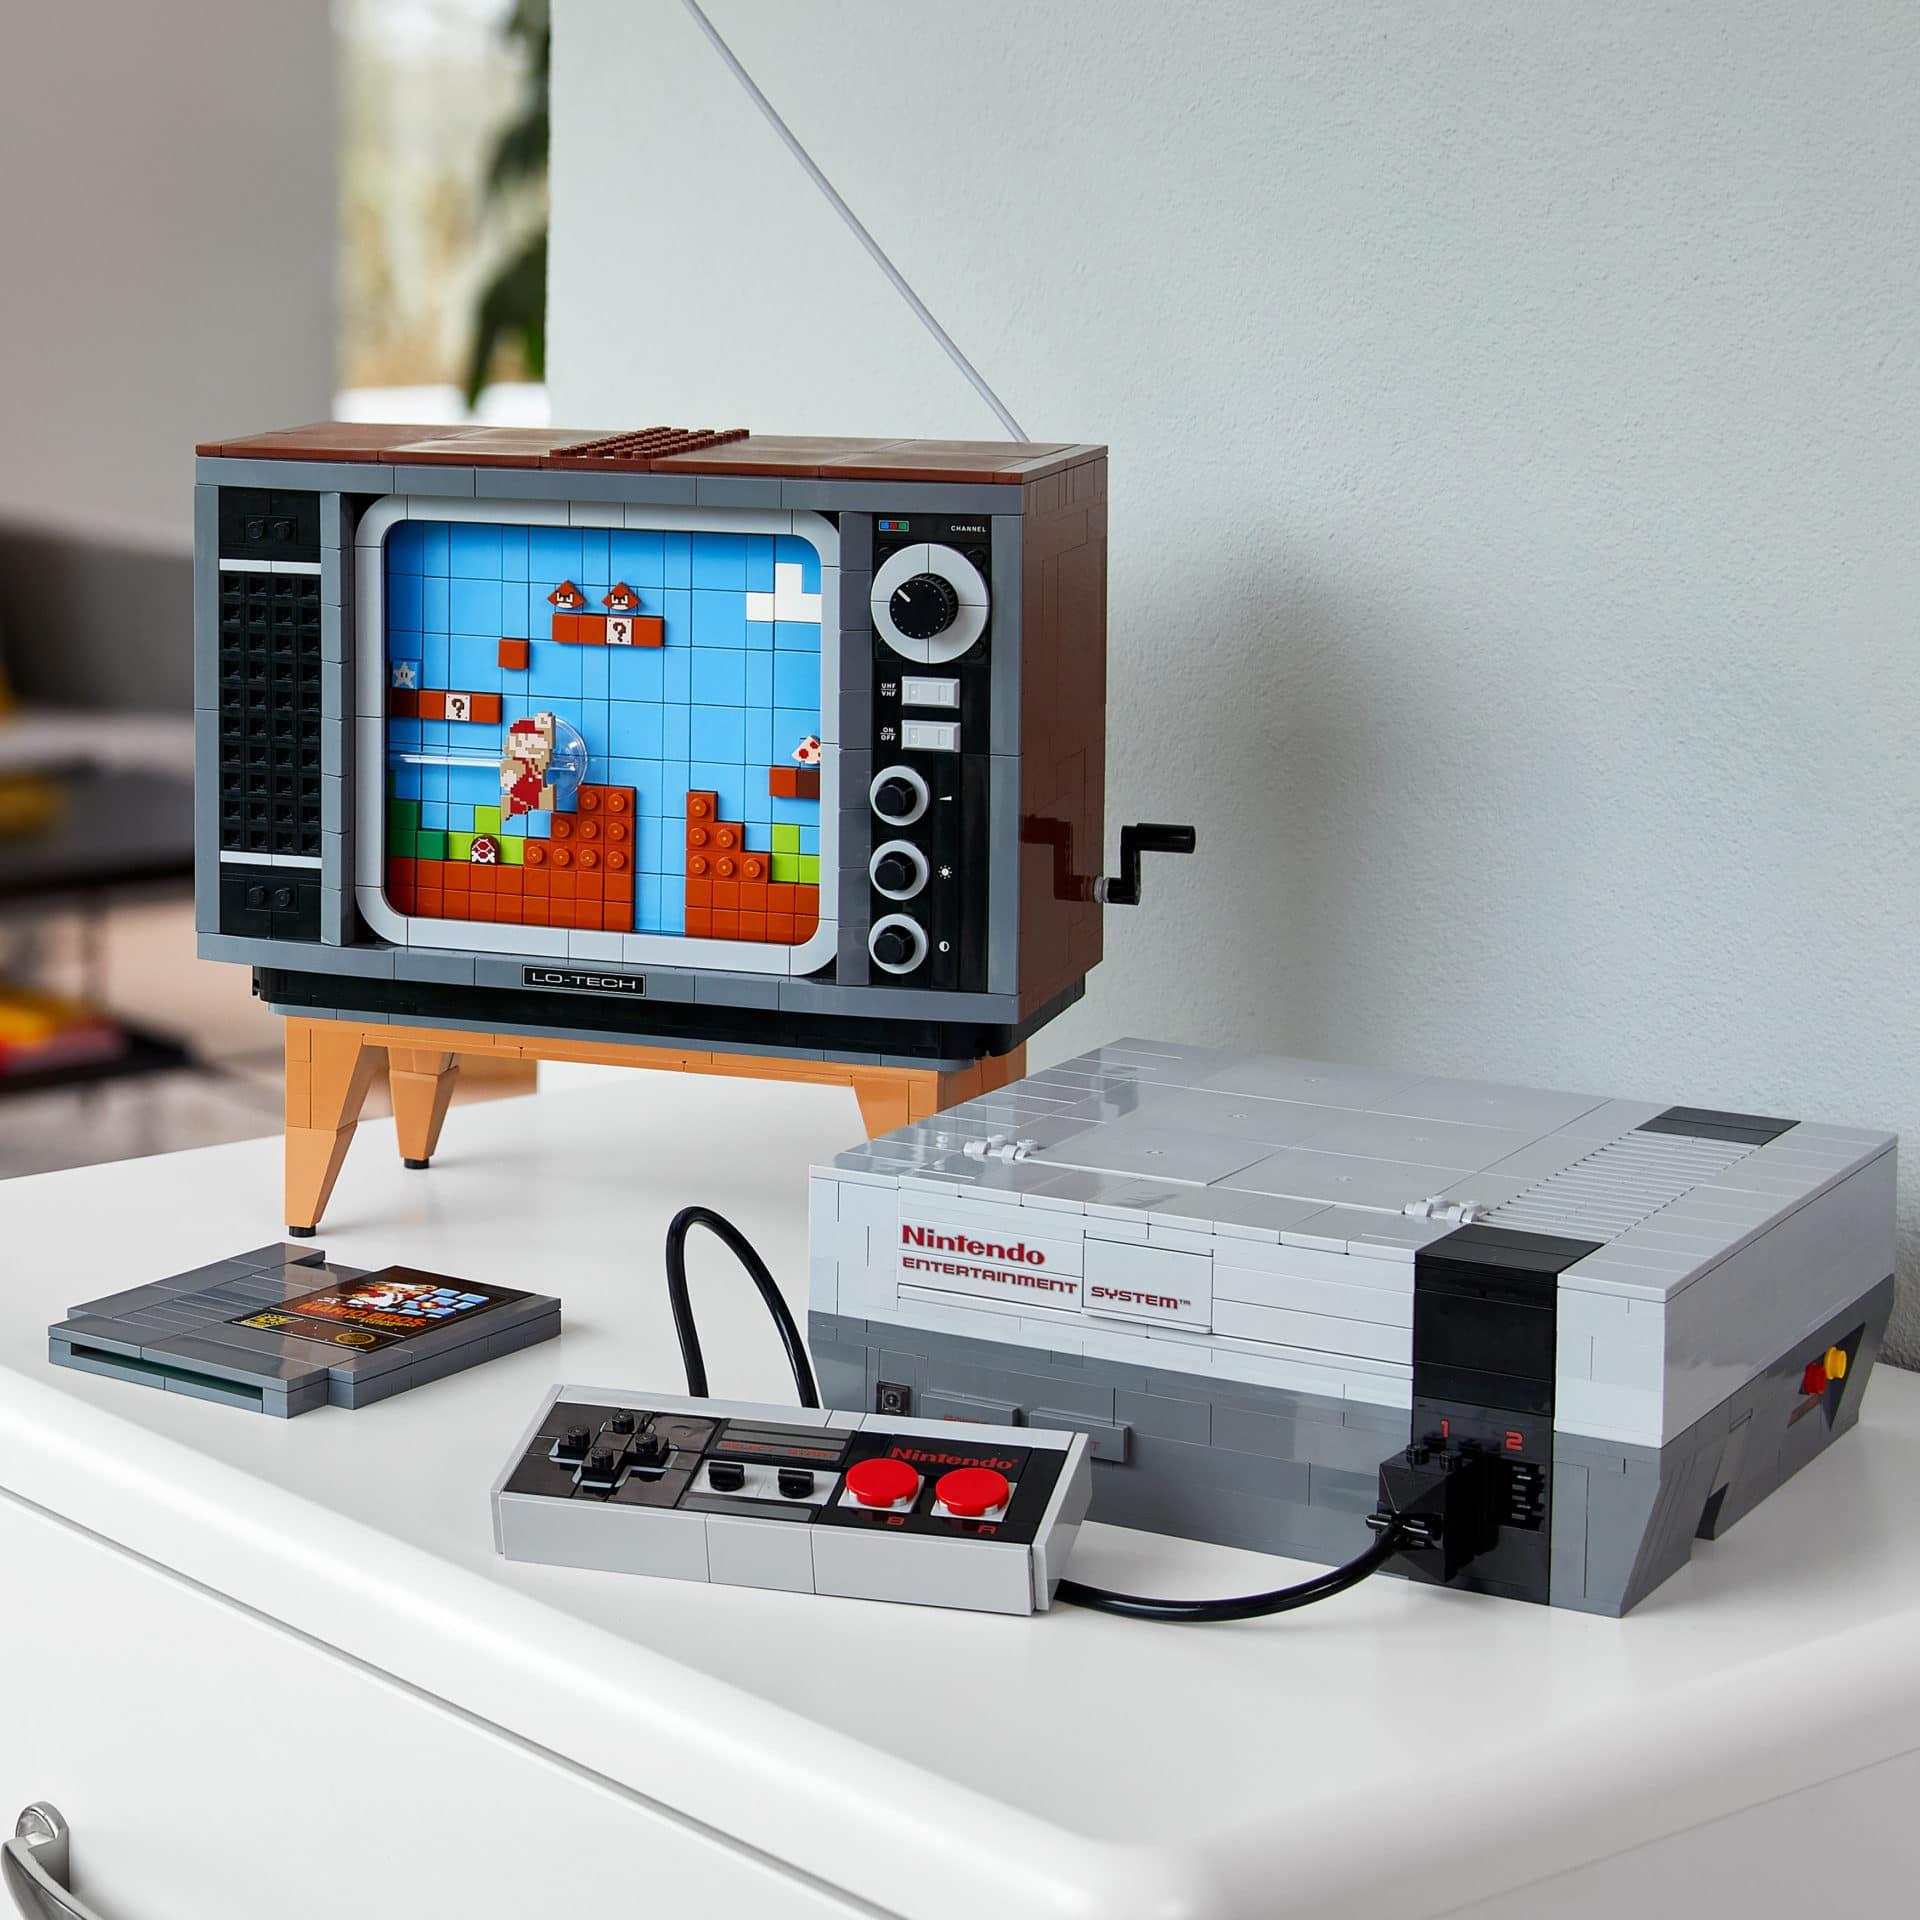 LEGO Nintendo Entertainment System: Bauklotz-Konsole zum Luxuspreis